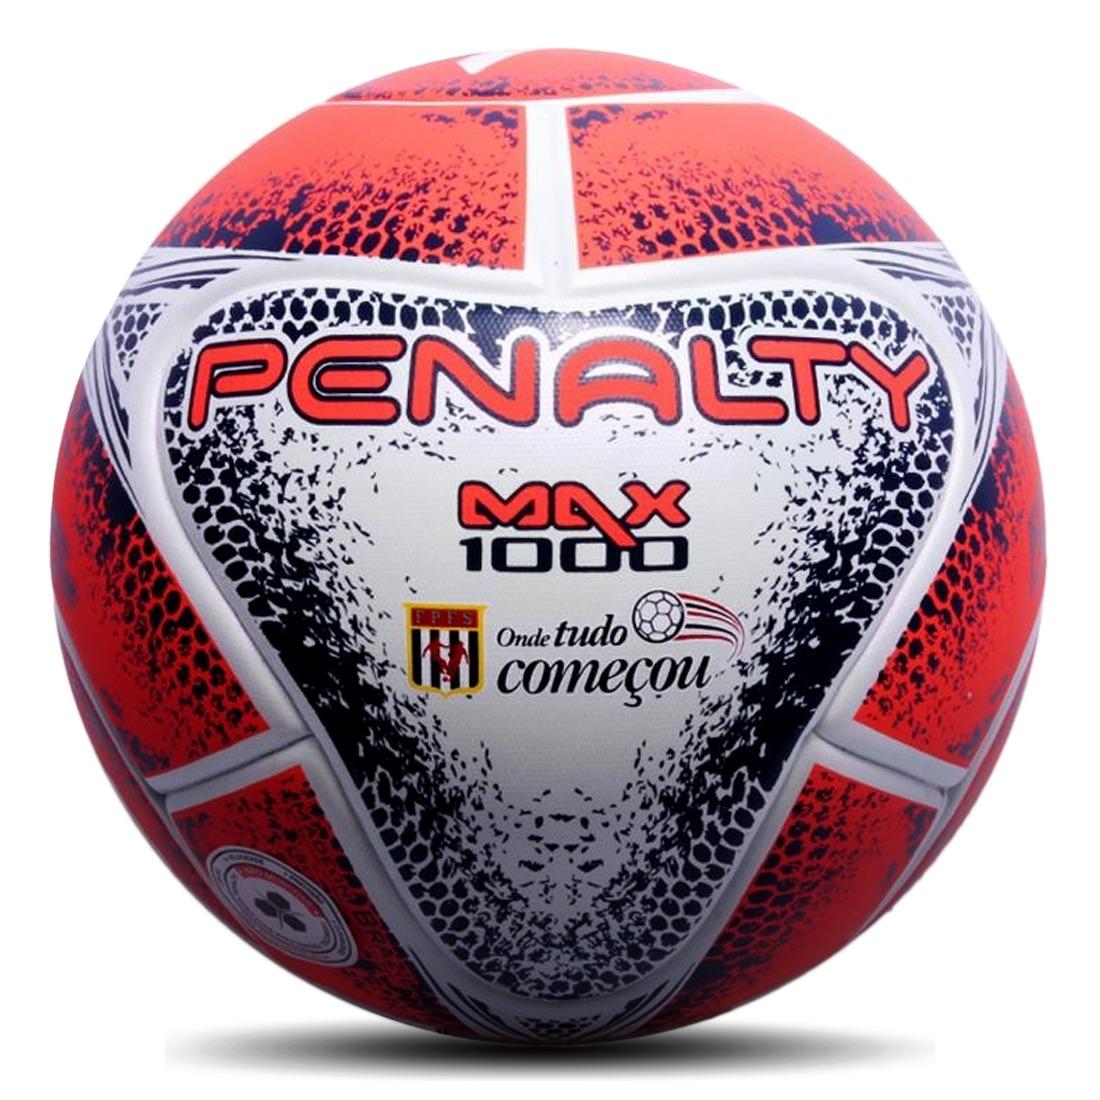 ff862e6db6 bola futsal penalty max 1000 aprovada fifa 2018 original. Carregando zoom.